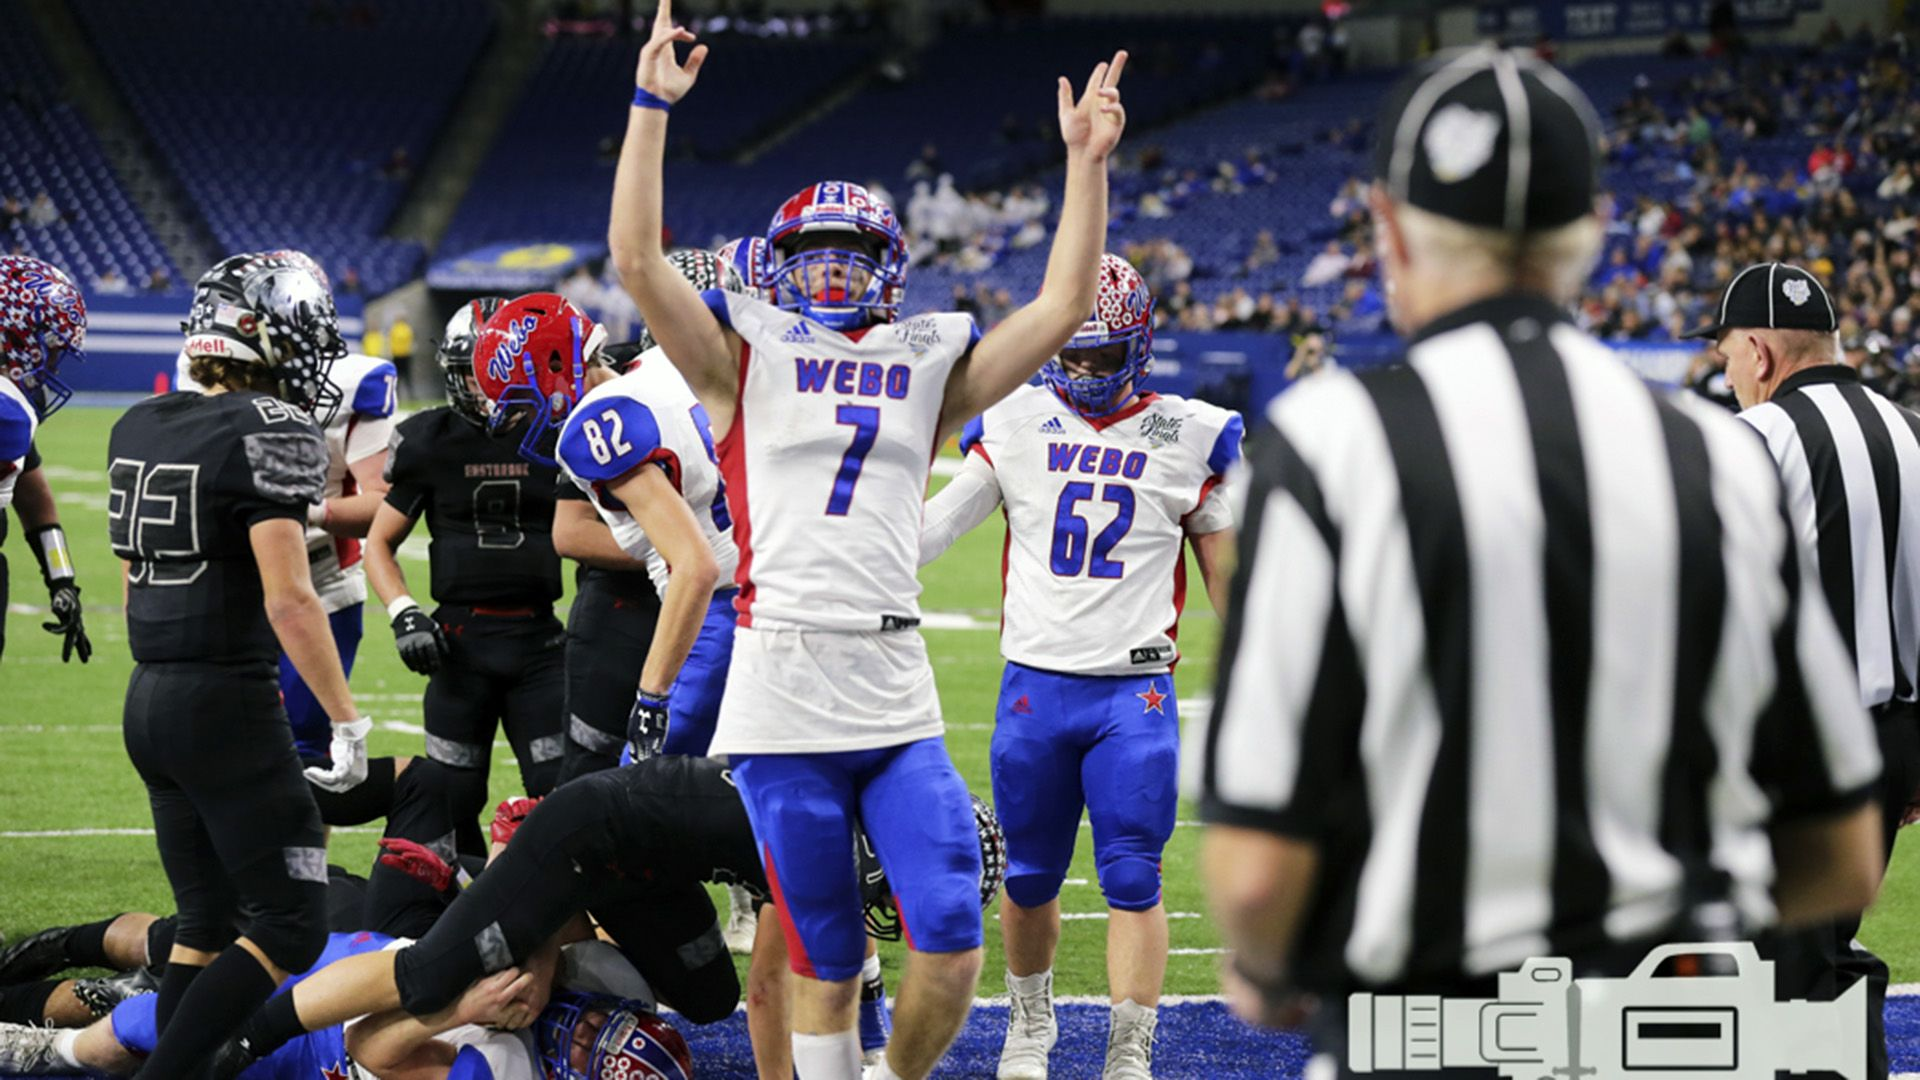 2A: Western Boone vs. Eastbrook